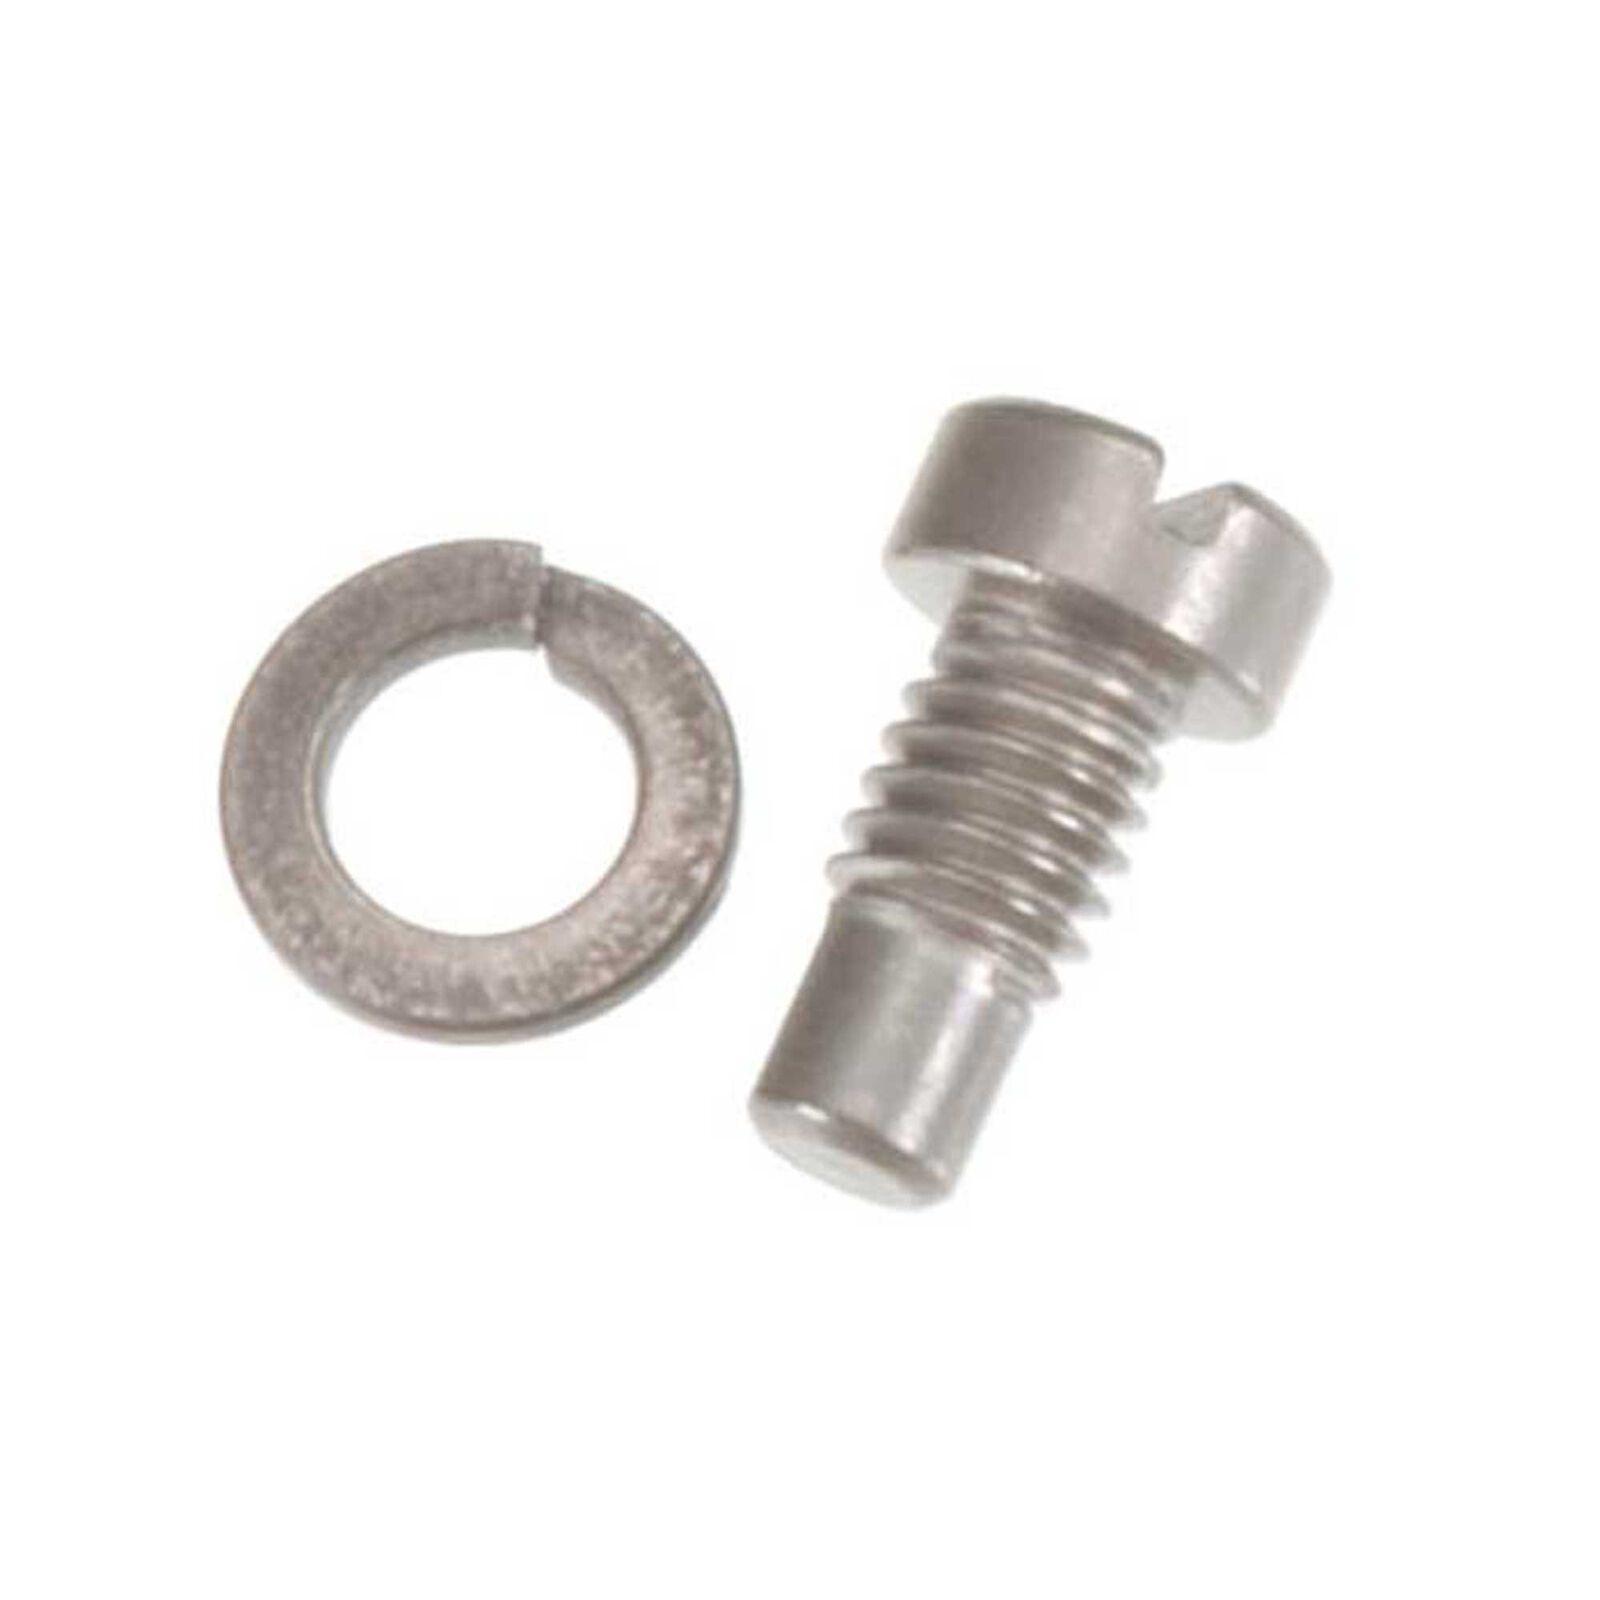 Rotor Guide Screw: F90-300